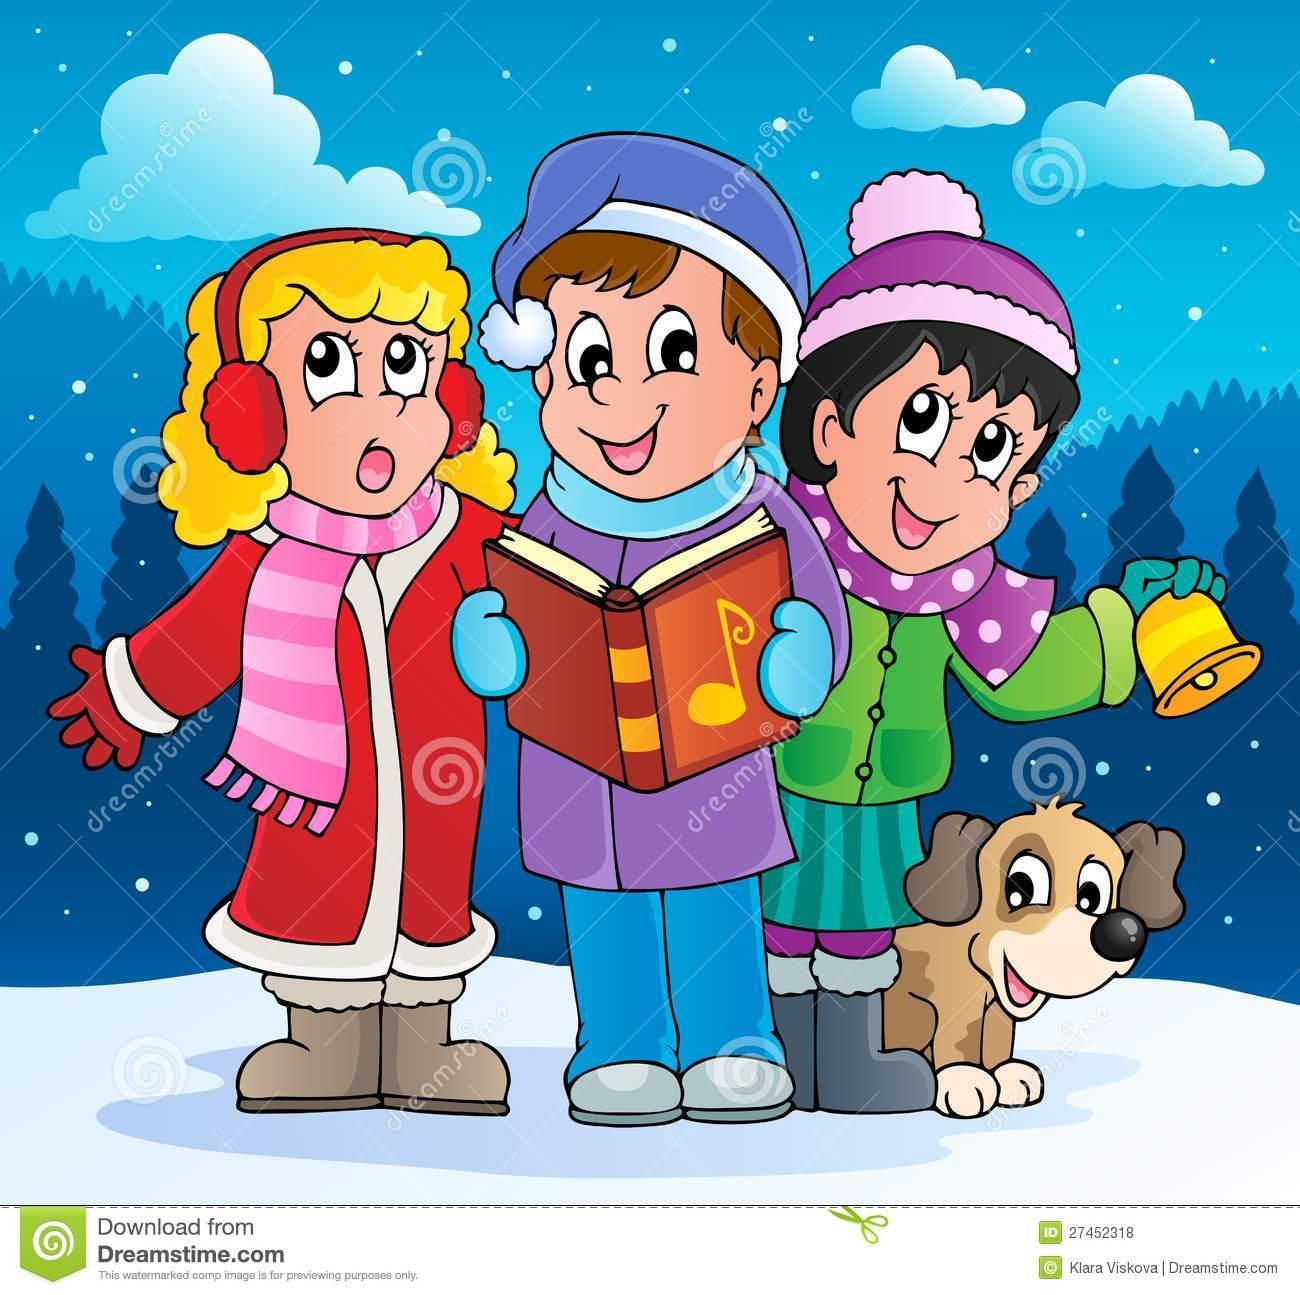 Christmas carol singers clipart free banner royalty free Christmas carol singers clipart free 5 » Clipart Portal banner royalty free